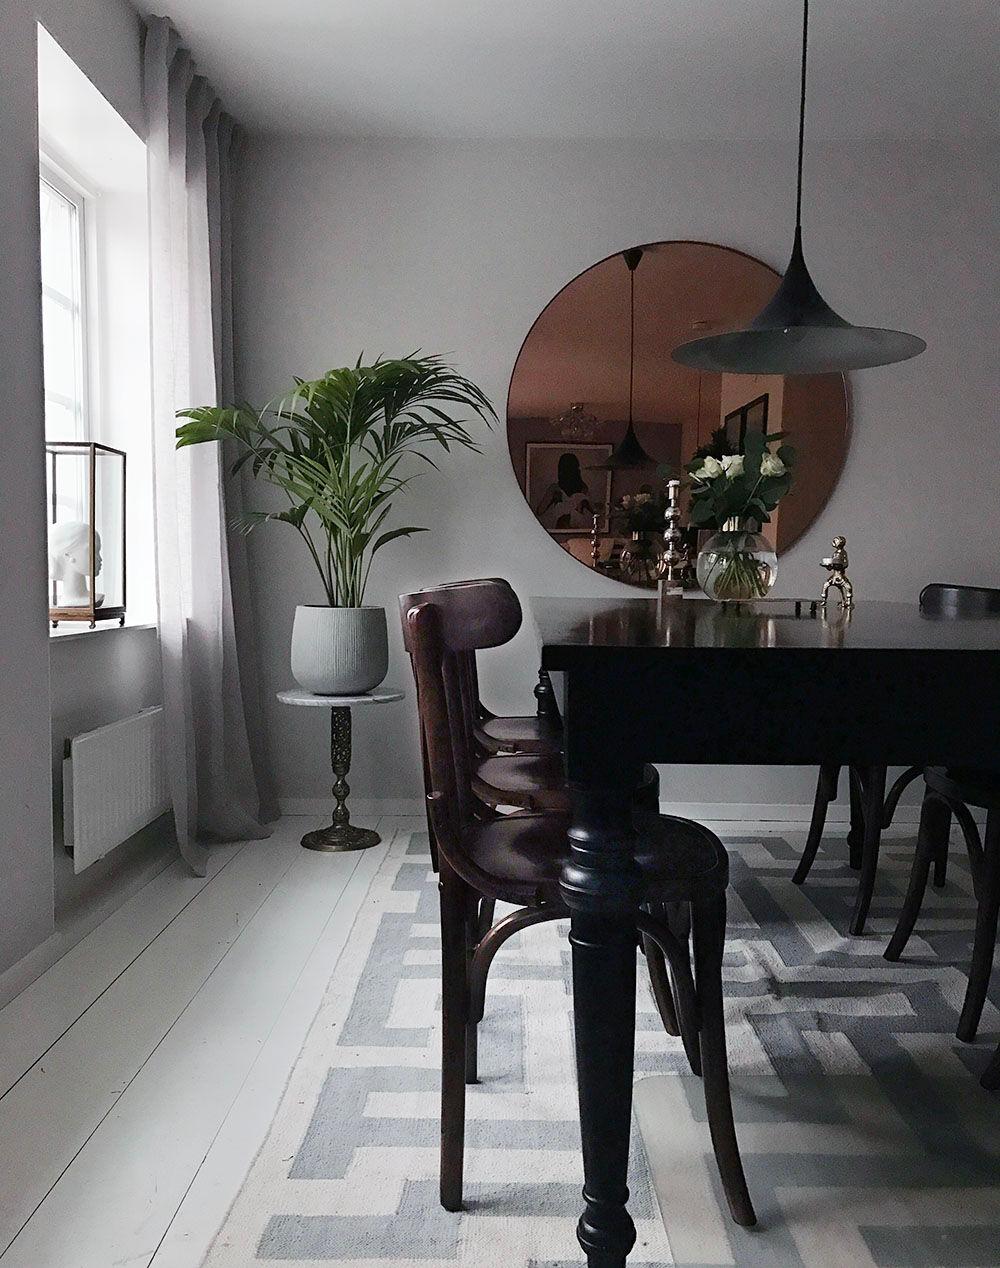 piedestal addsimplicity matsal-Återställd